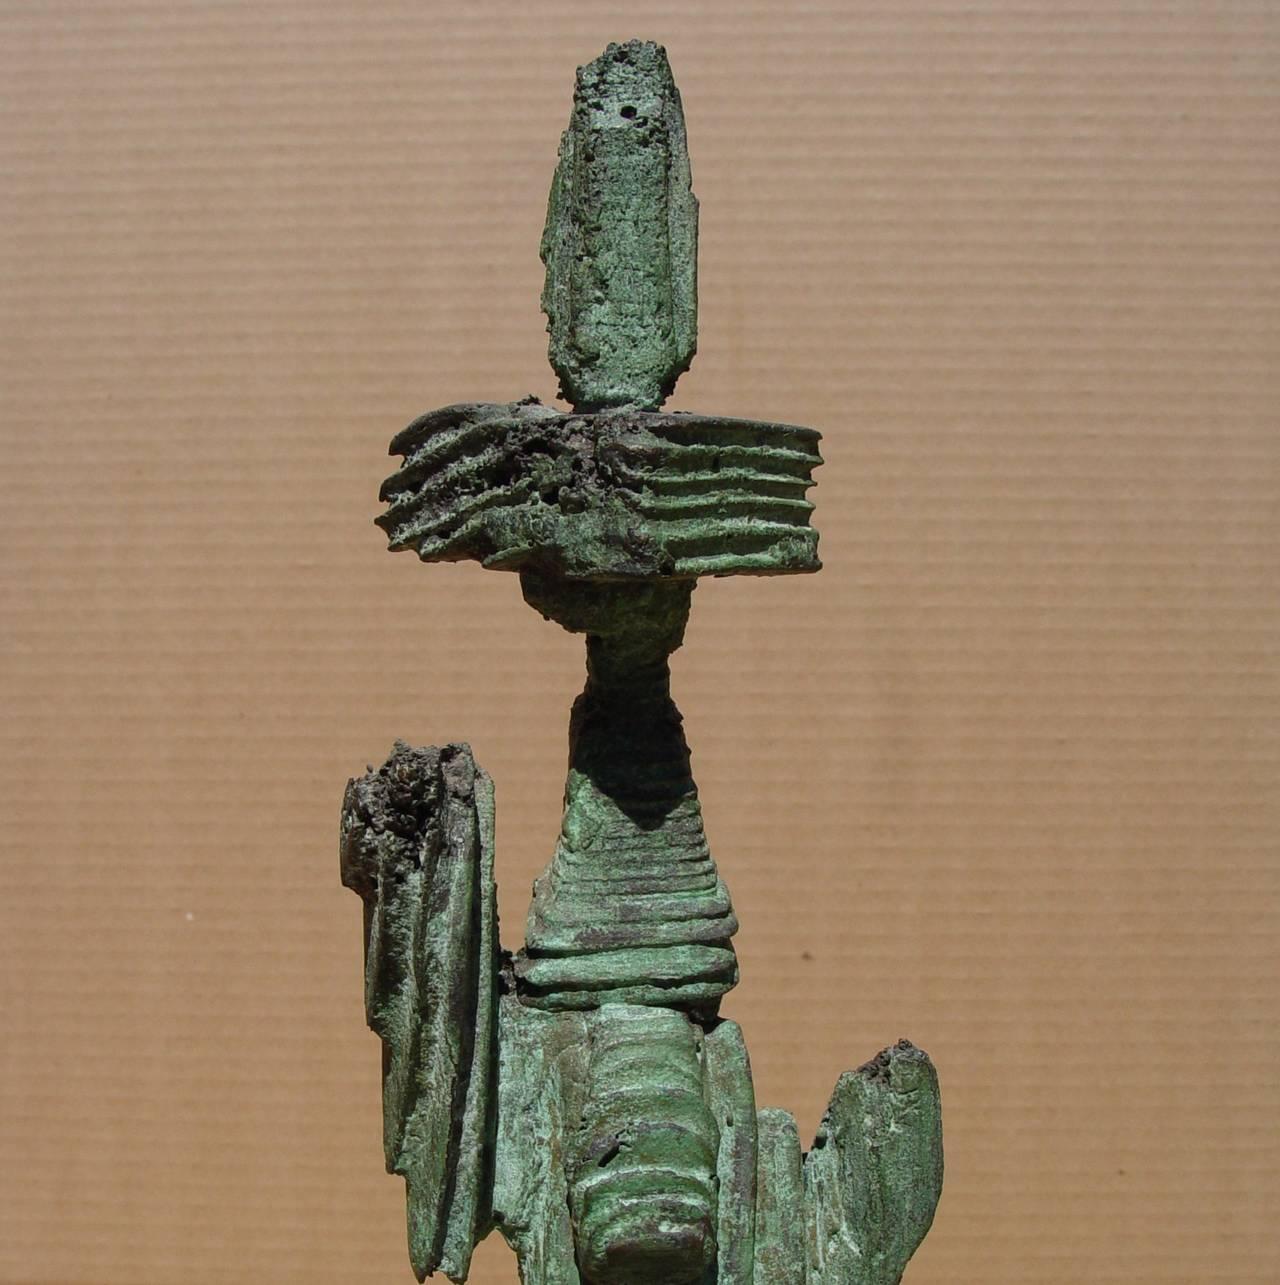 Totem - Brown Abstract Sculpture by Mirko Basaldella